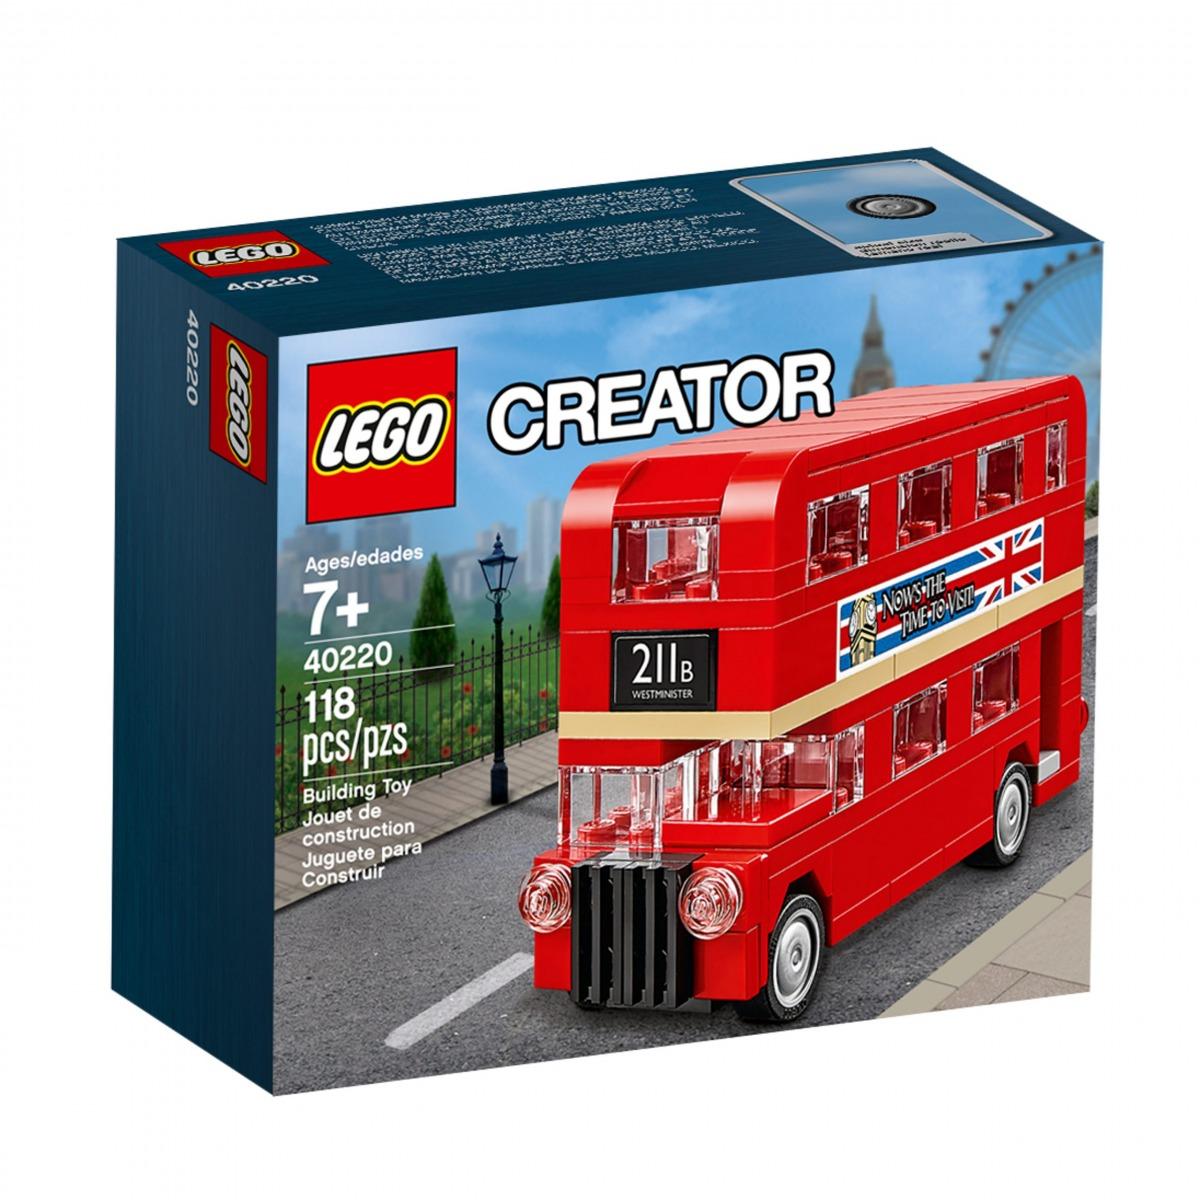 bus londonien lego 40220 scaled